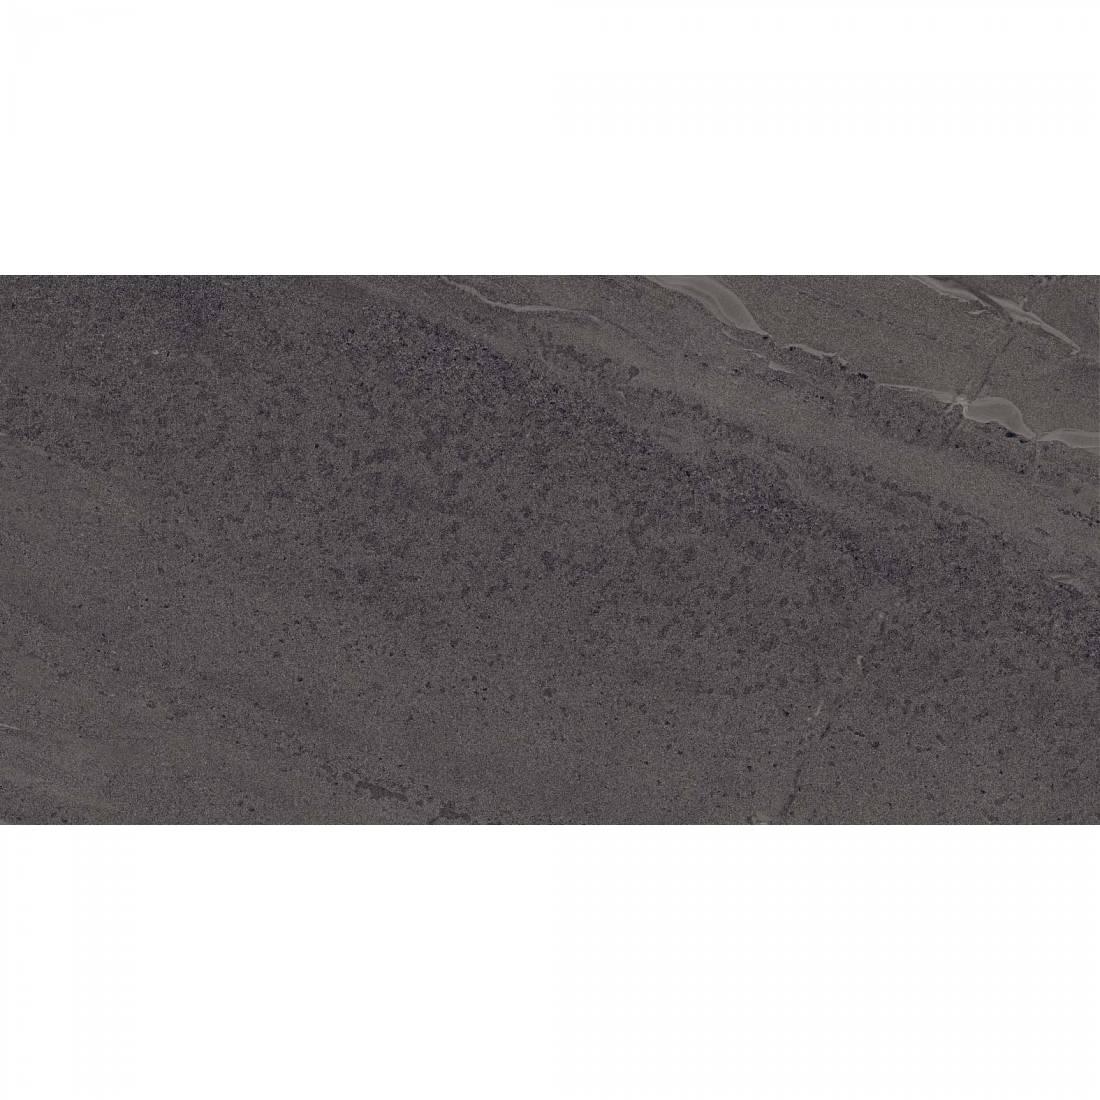 Strata 30x60 Anthracite Polished 1